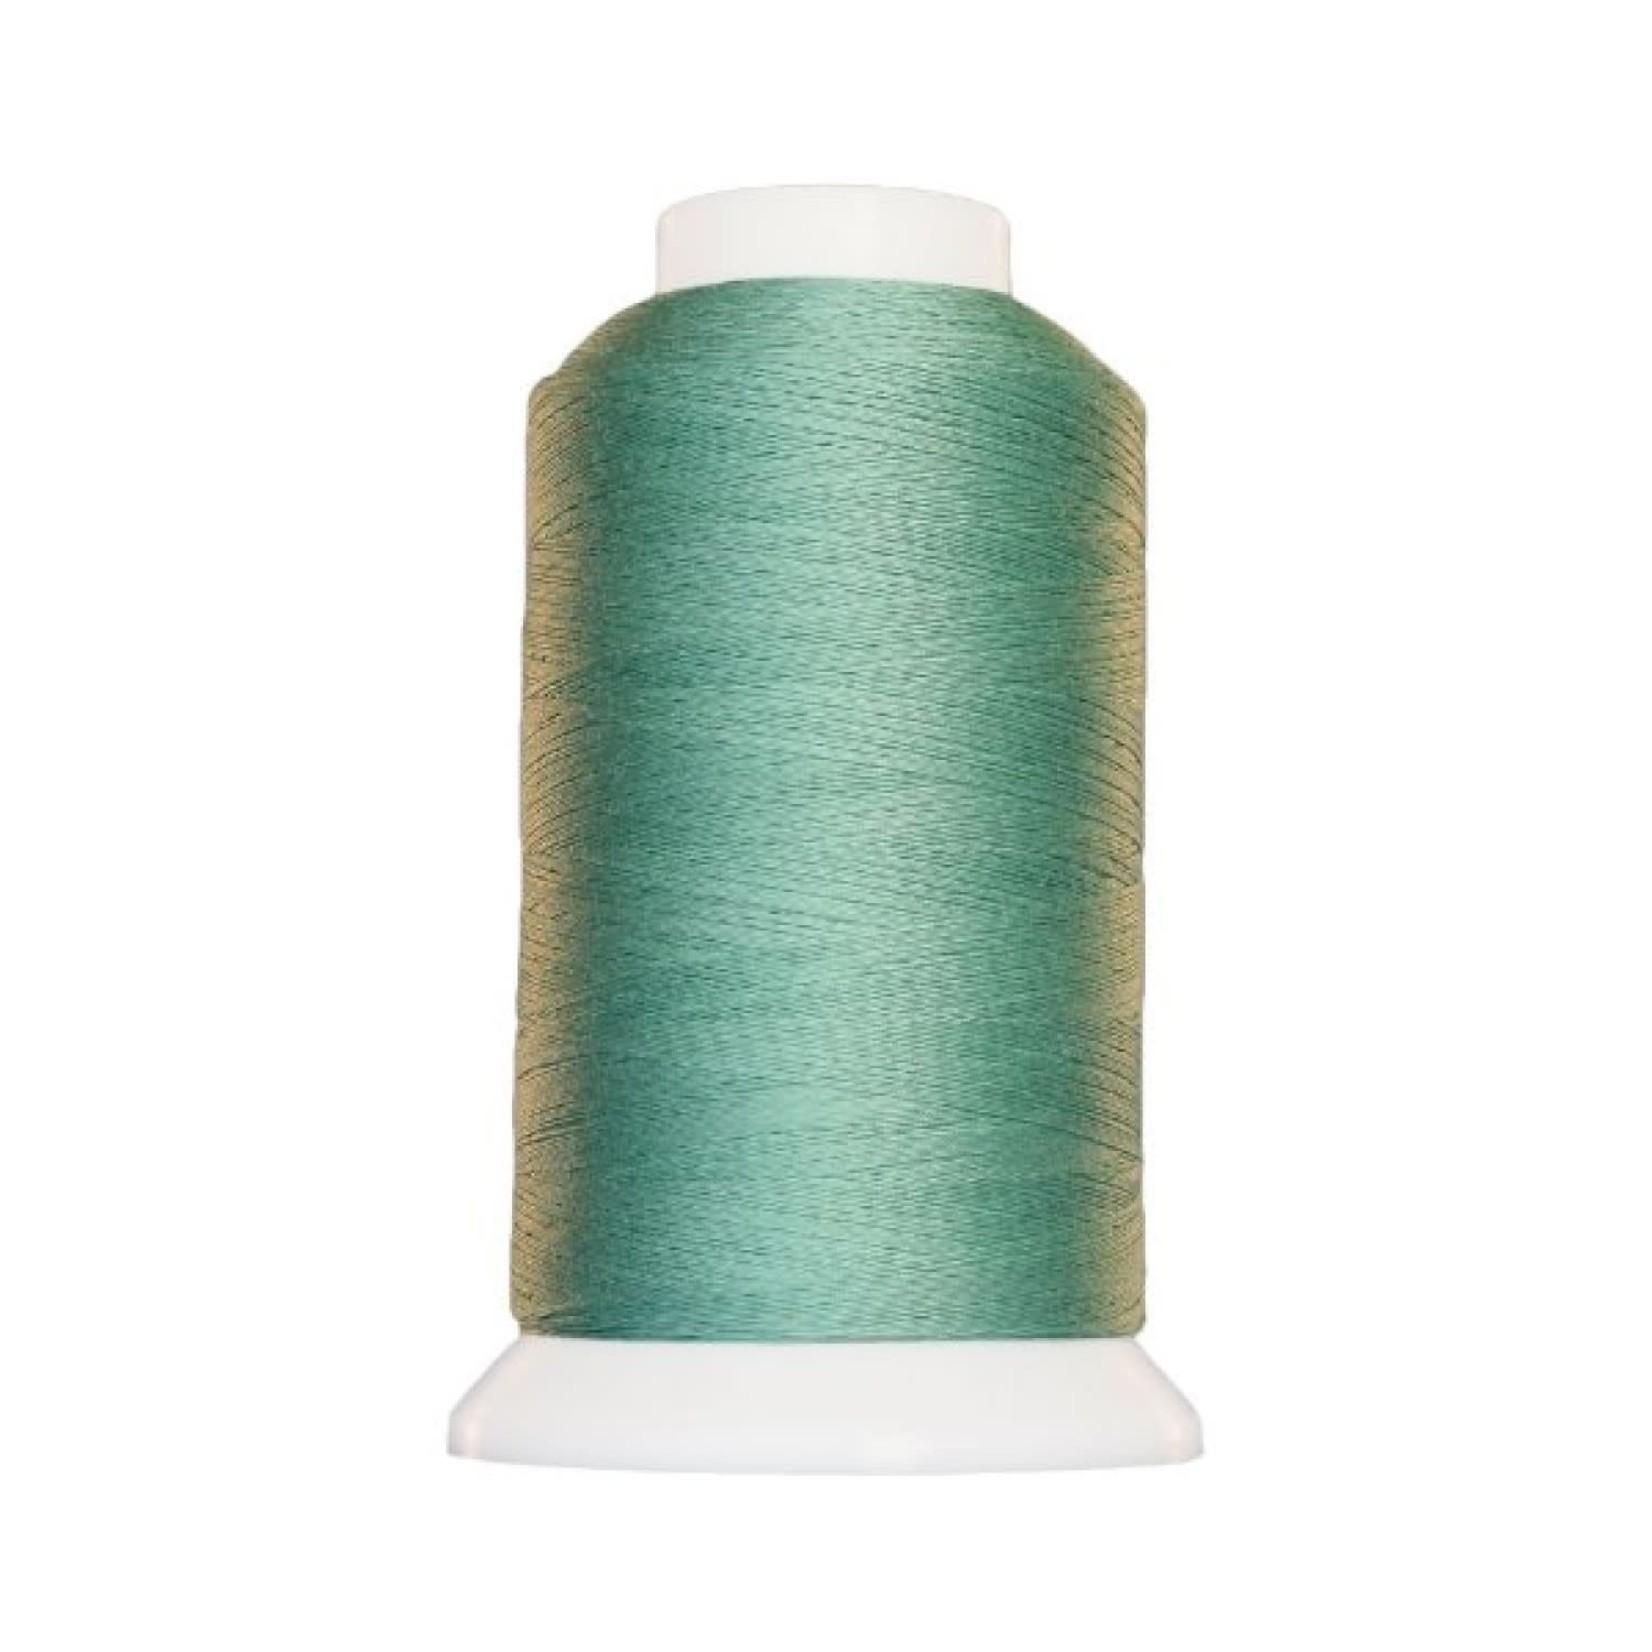 Superior Threads King Tut - #40 - 1828 m - 1023 Mint Julep